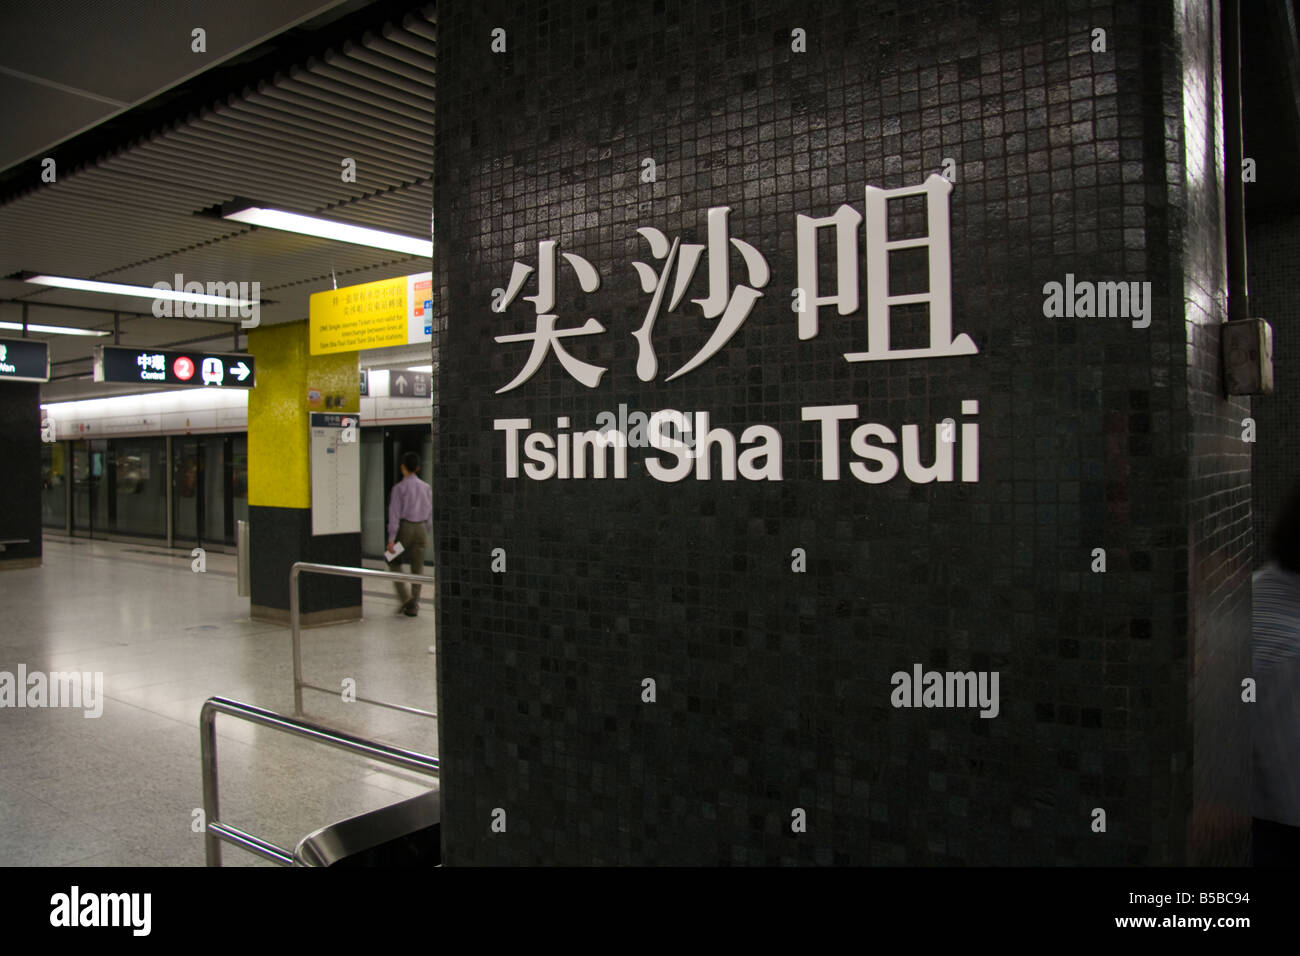 Tsim Sha Tsui MTR underground station sign, Hong Kong - Stock Image